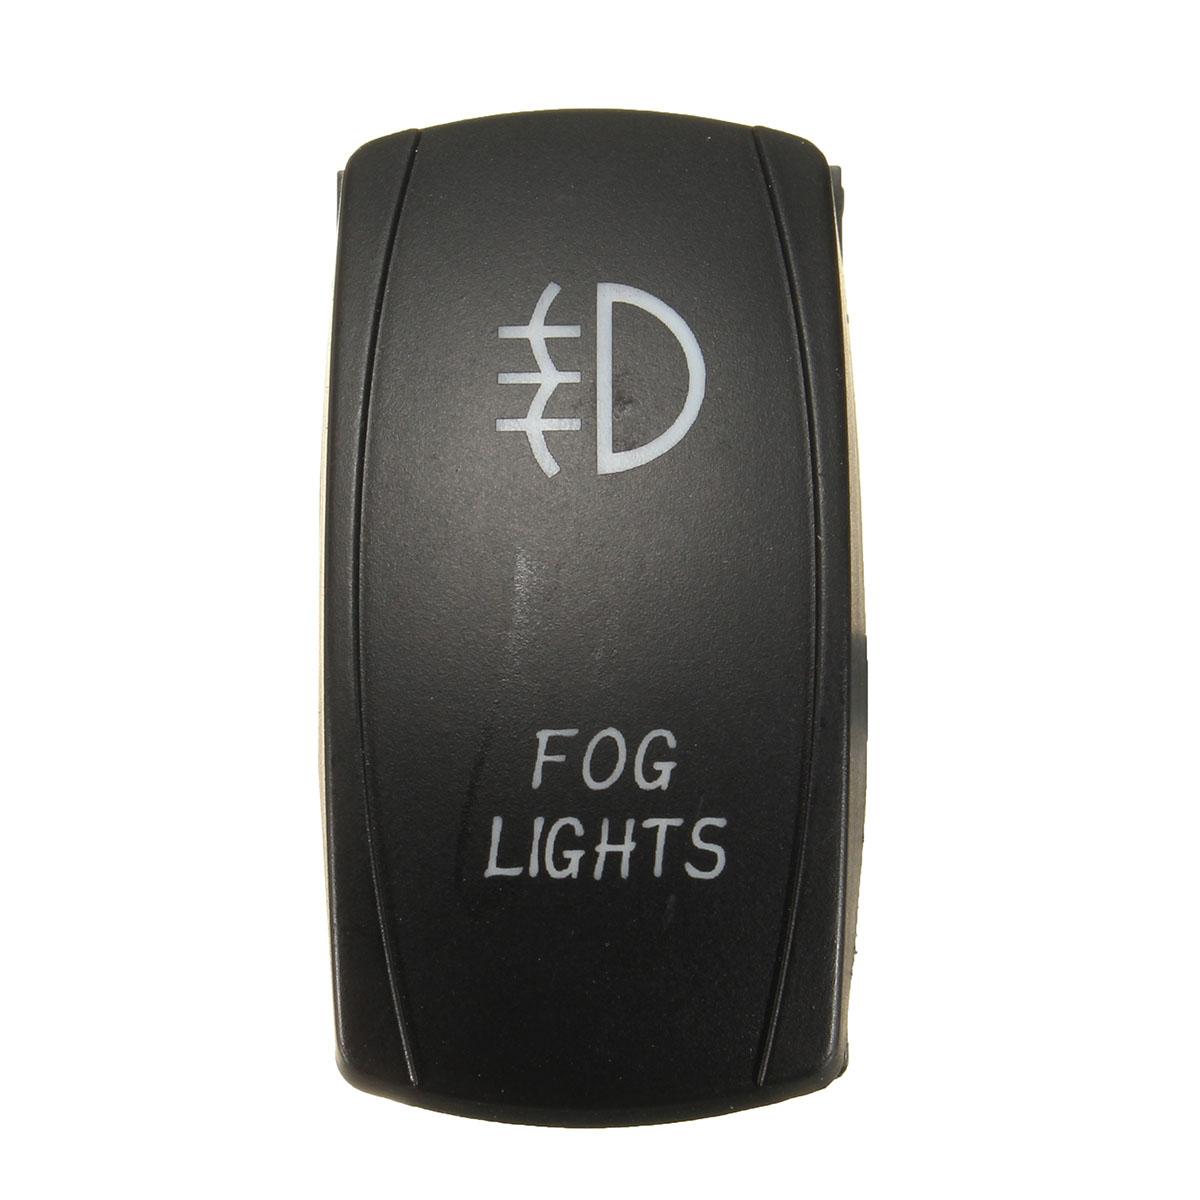 Incredible 12V 40A Car Rocker Switch Wiring Harness Led Fog Light Driving Lamp Wiring Cloud Xempagosophoxytasticioscodnessplanboapumohammedshrineorg